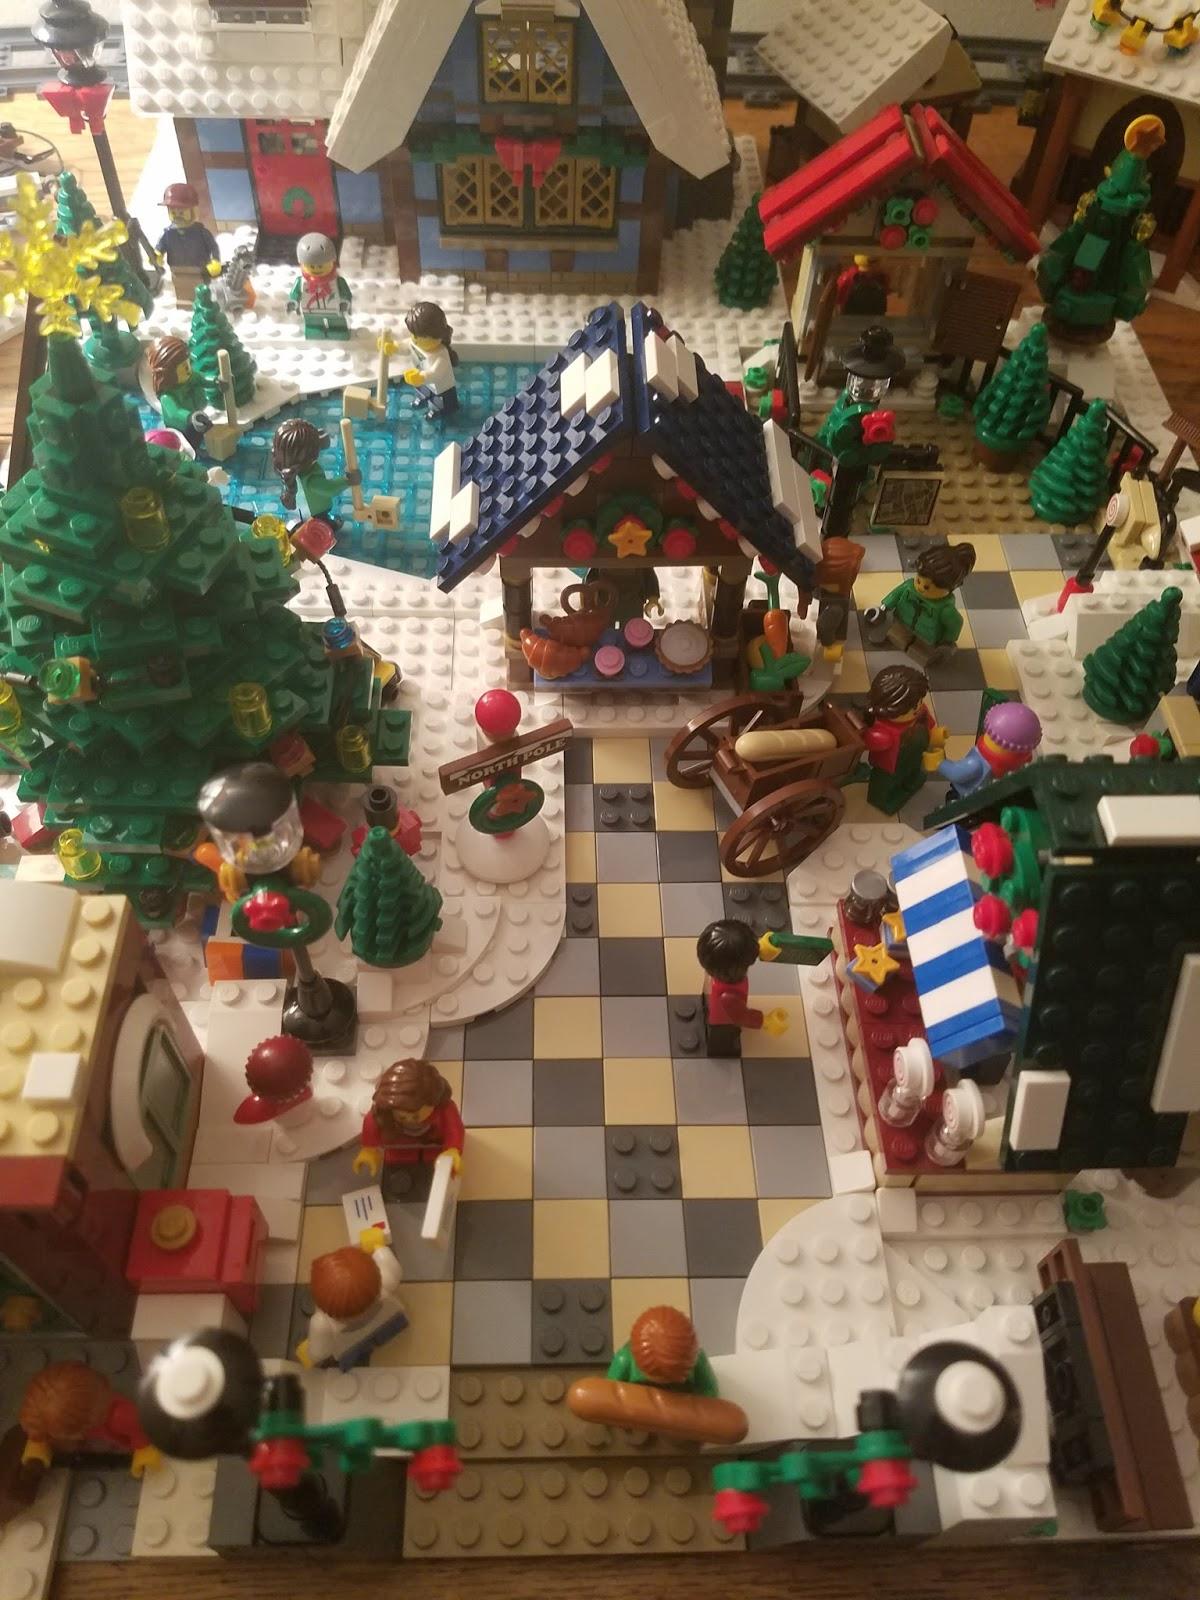 Village Christmas Tree Stand.Playing With Bricks Custom Lego Winter Village 2017 Edition